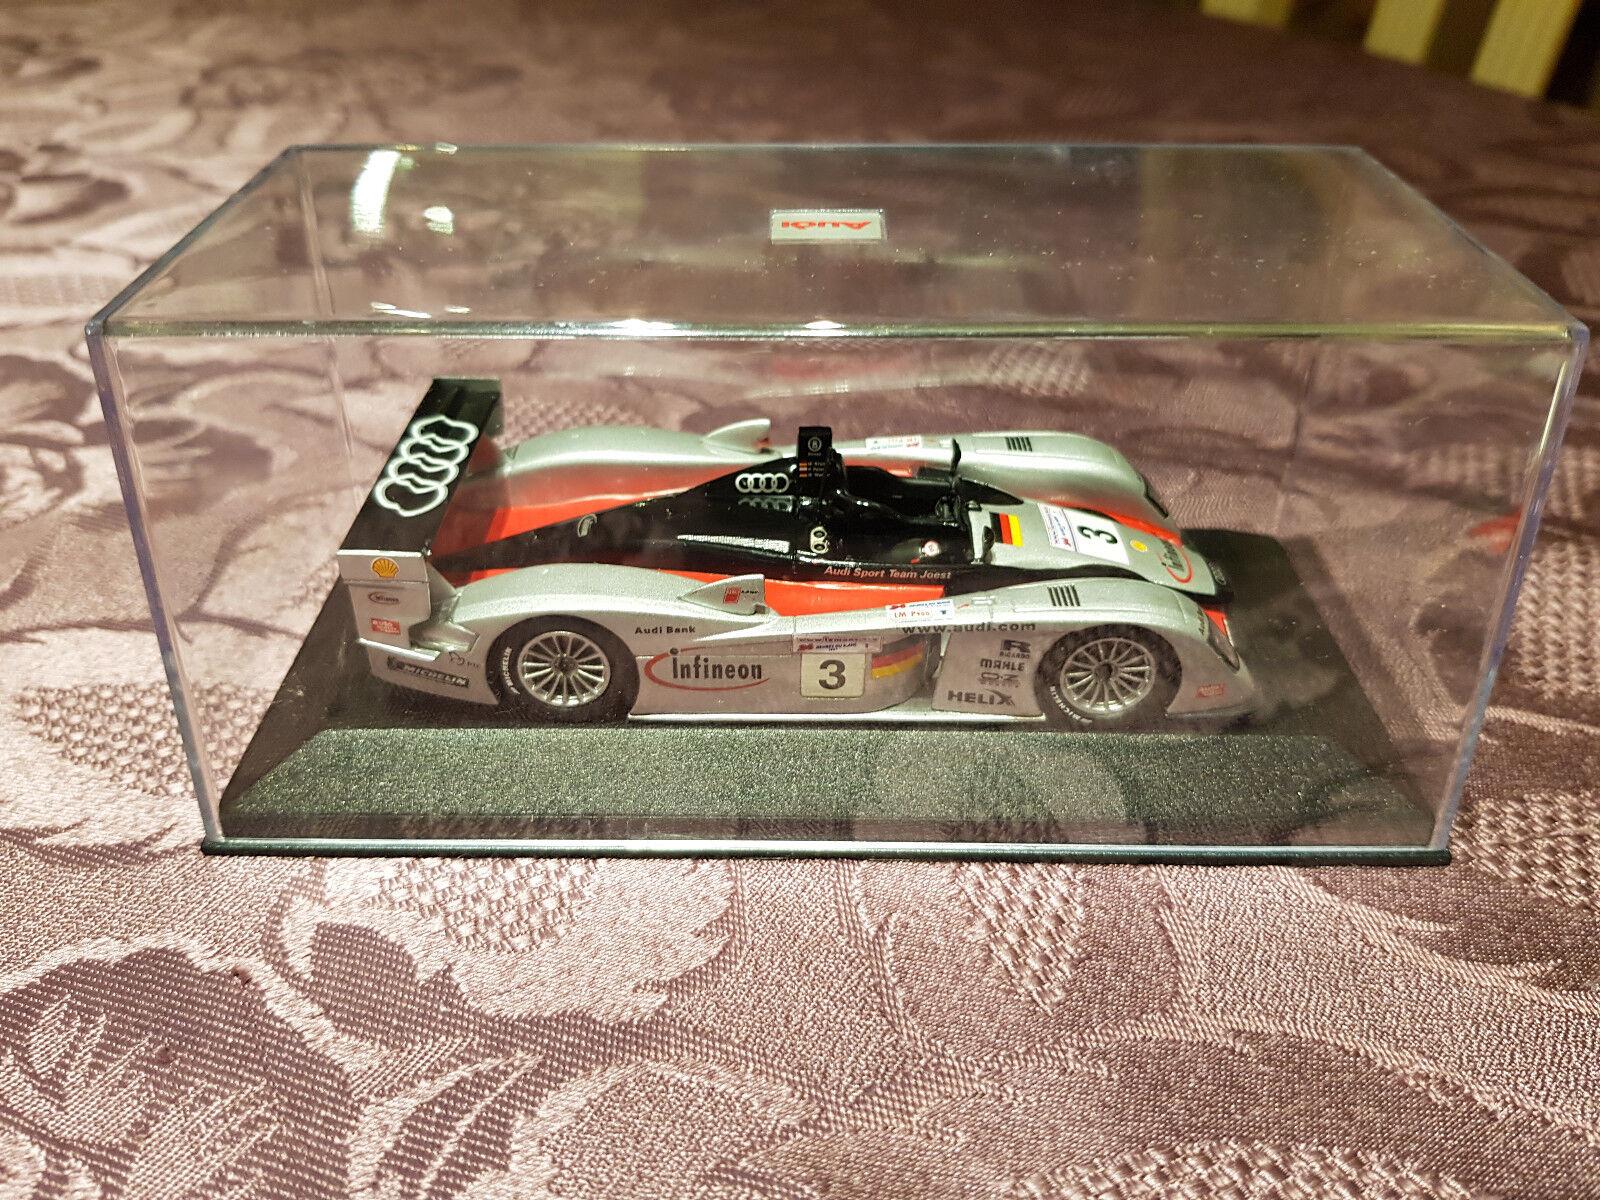 Voiture Voiture Voiture MINICHAMPS 24 Heures Mans Audi Collection Infineon N°3 Paul's 1 43 be2641